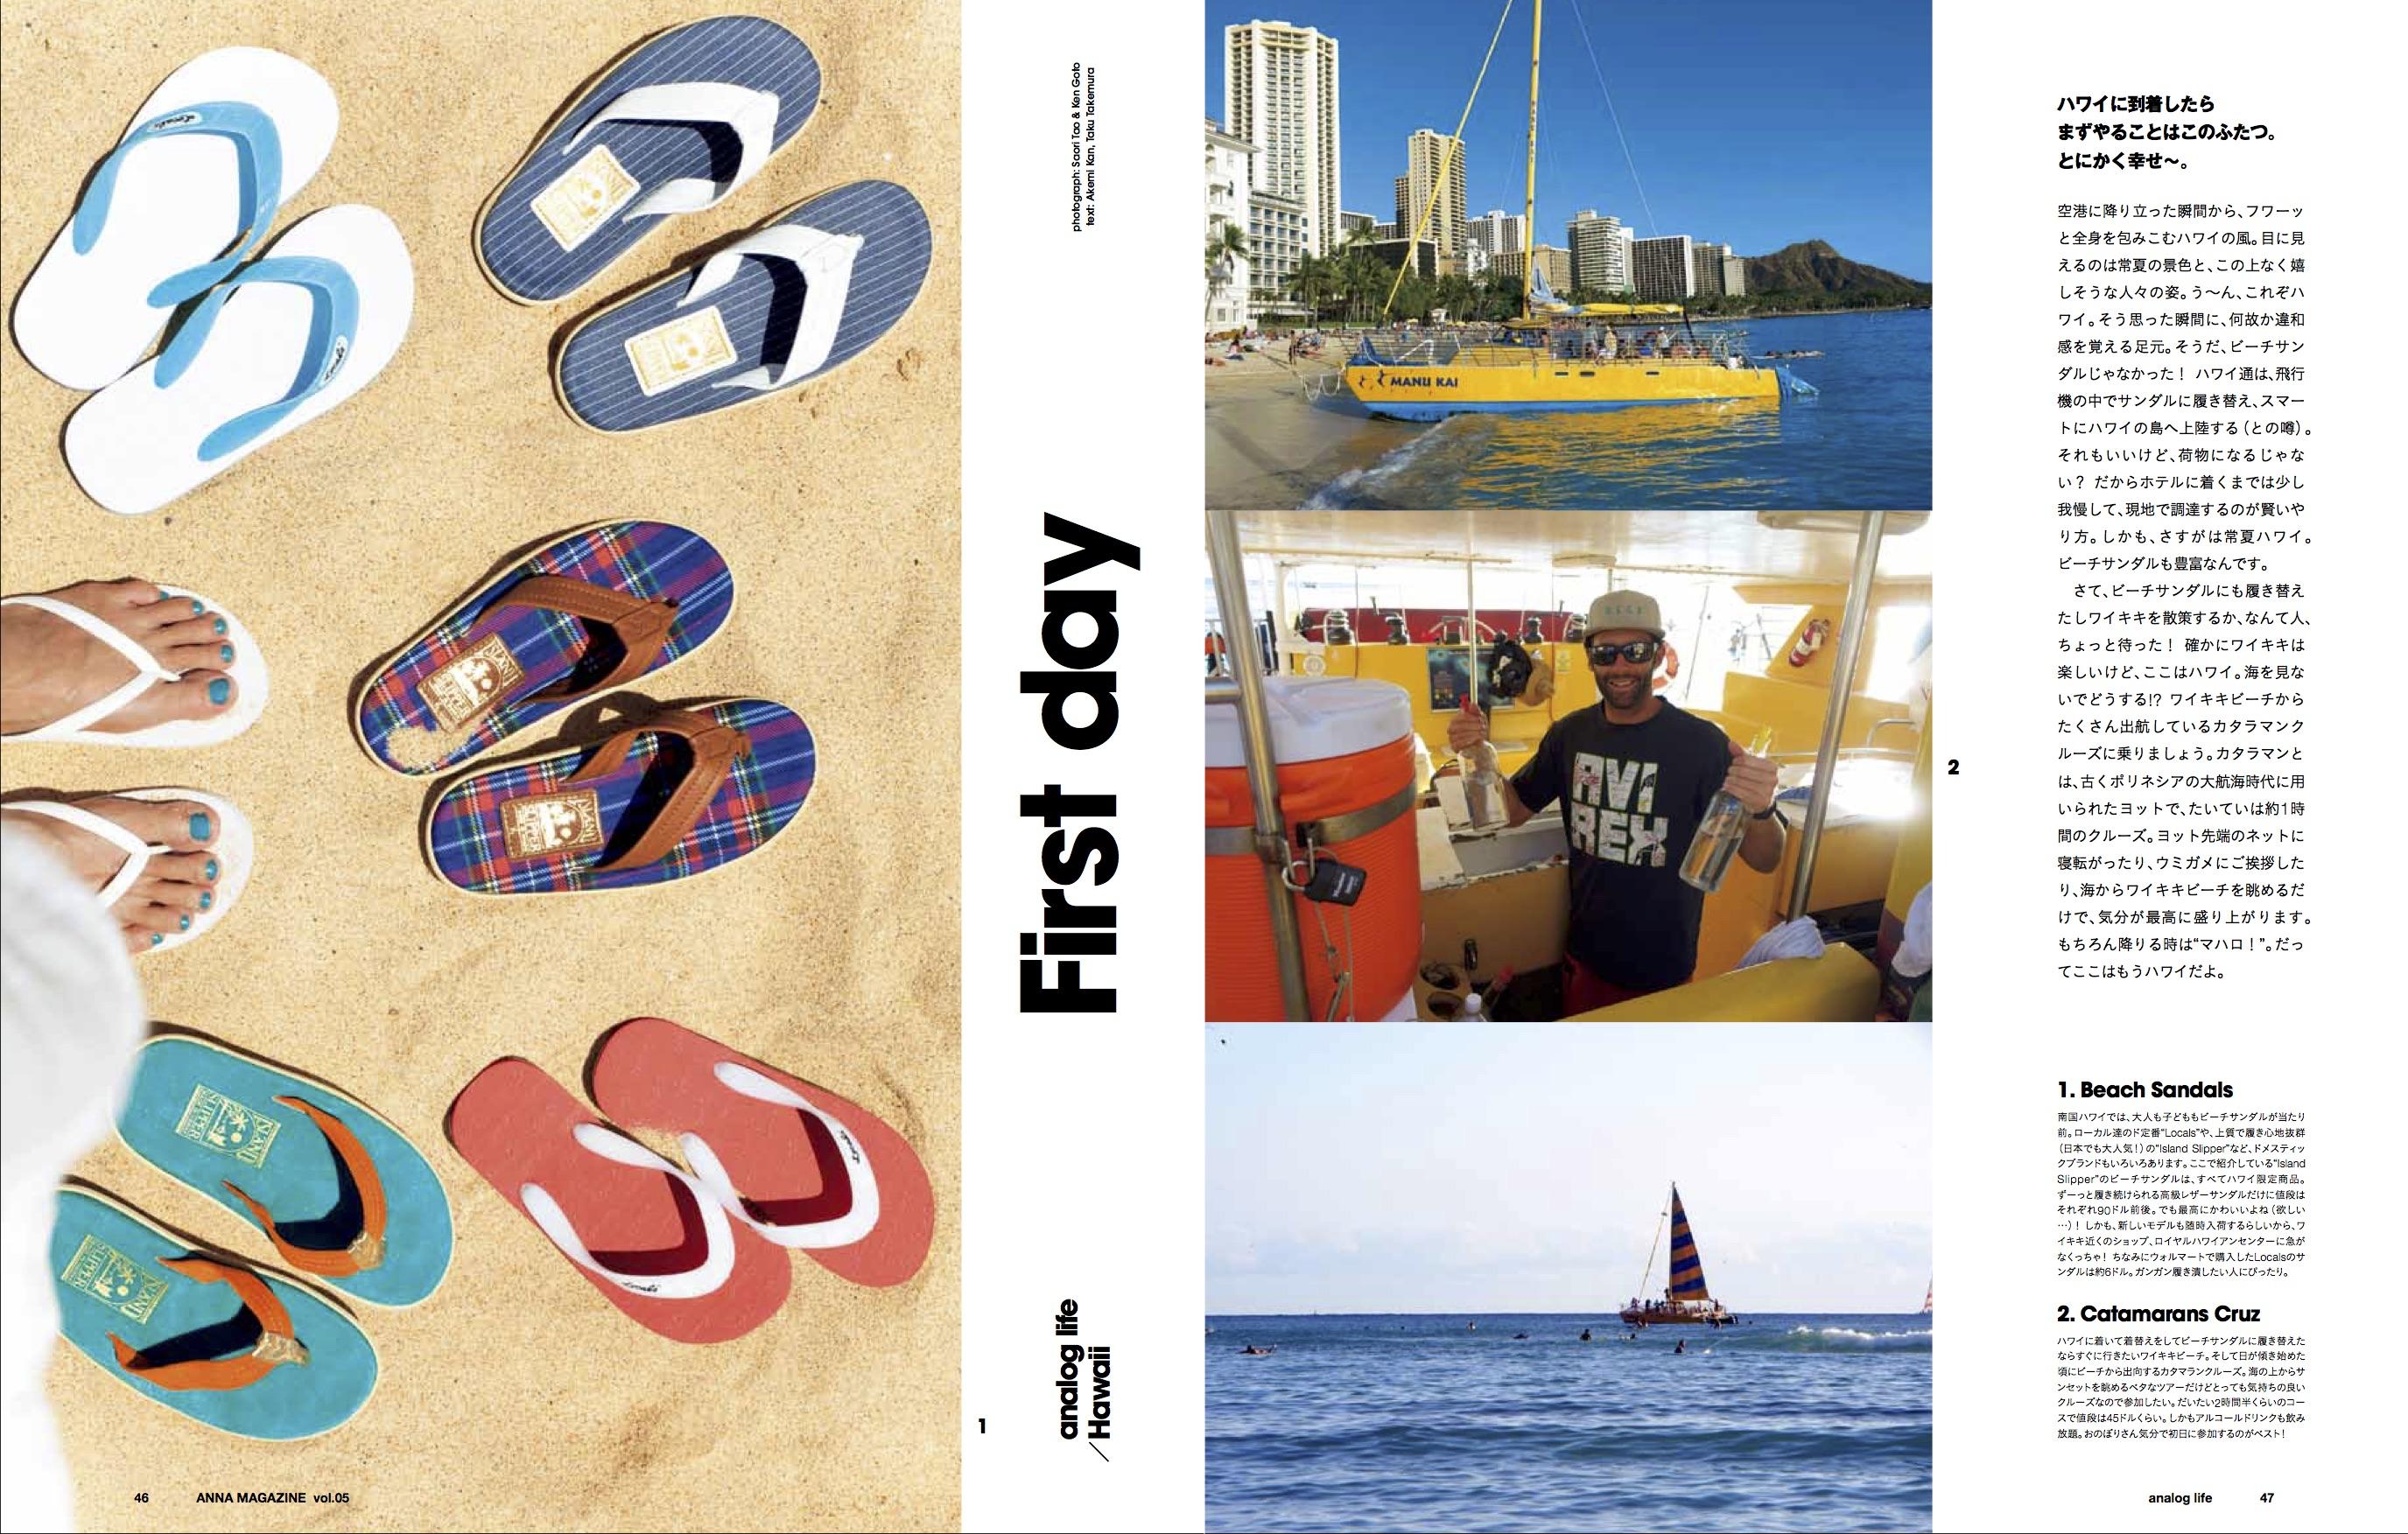 anna magazine Vol.5 P8